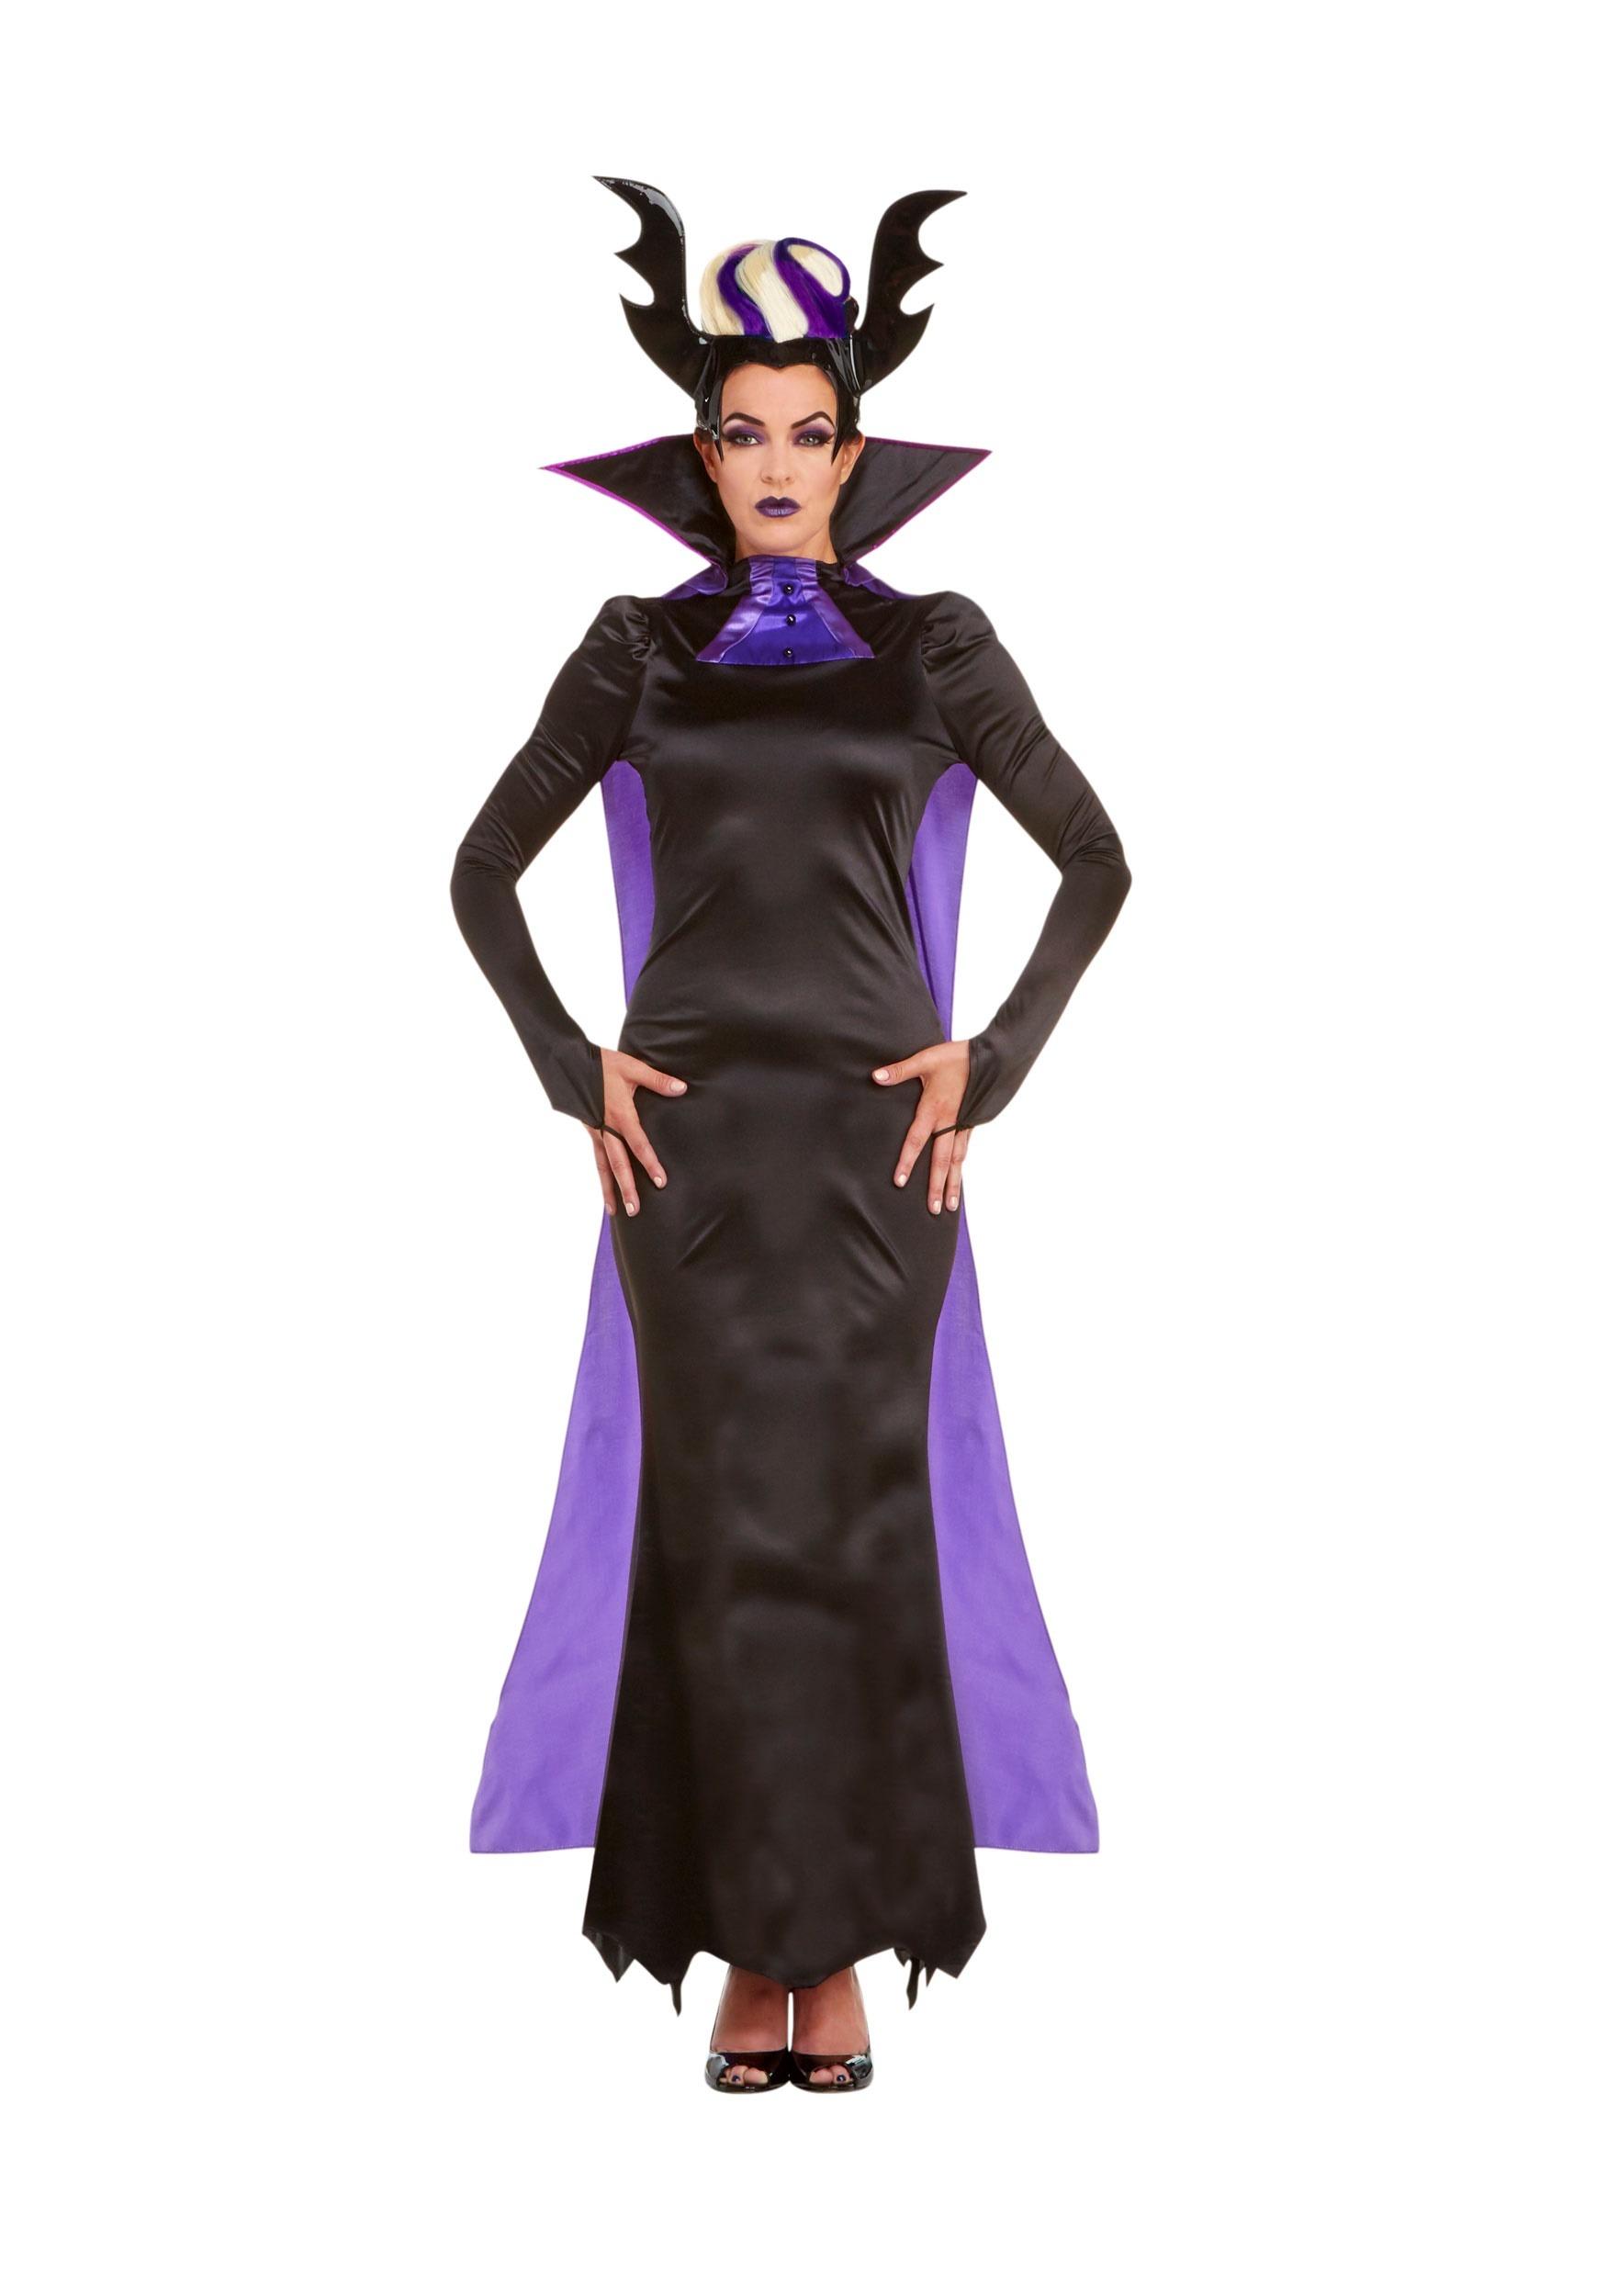 aunt lydia classic womens costume - Classic Womens Halloween Costumes